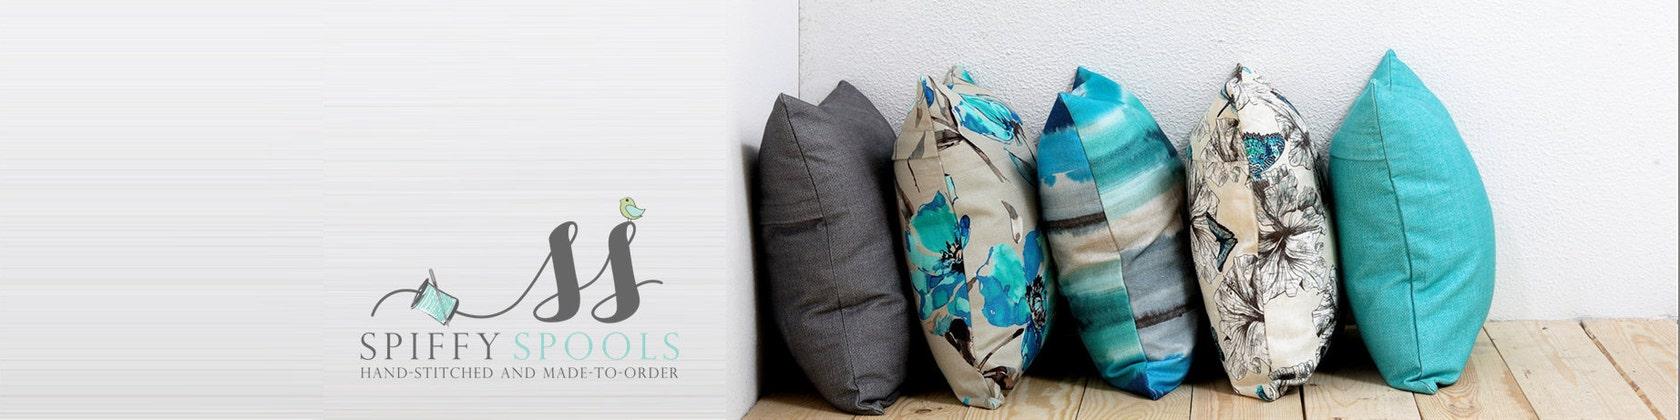 Fair priced custom curtains cushions by spiffyspools on etsy for Spiffy spools